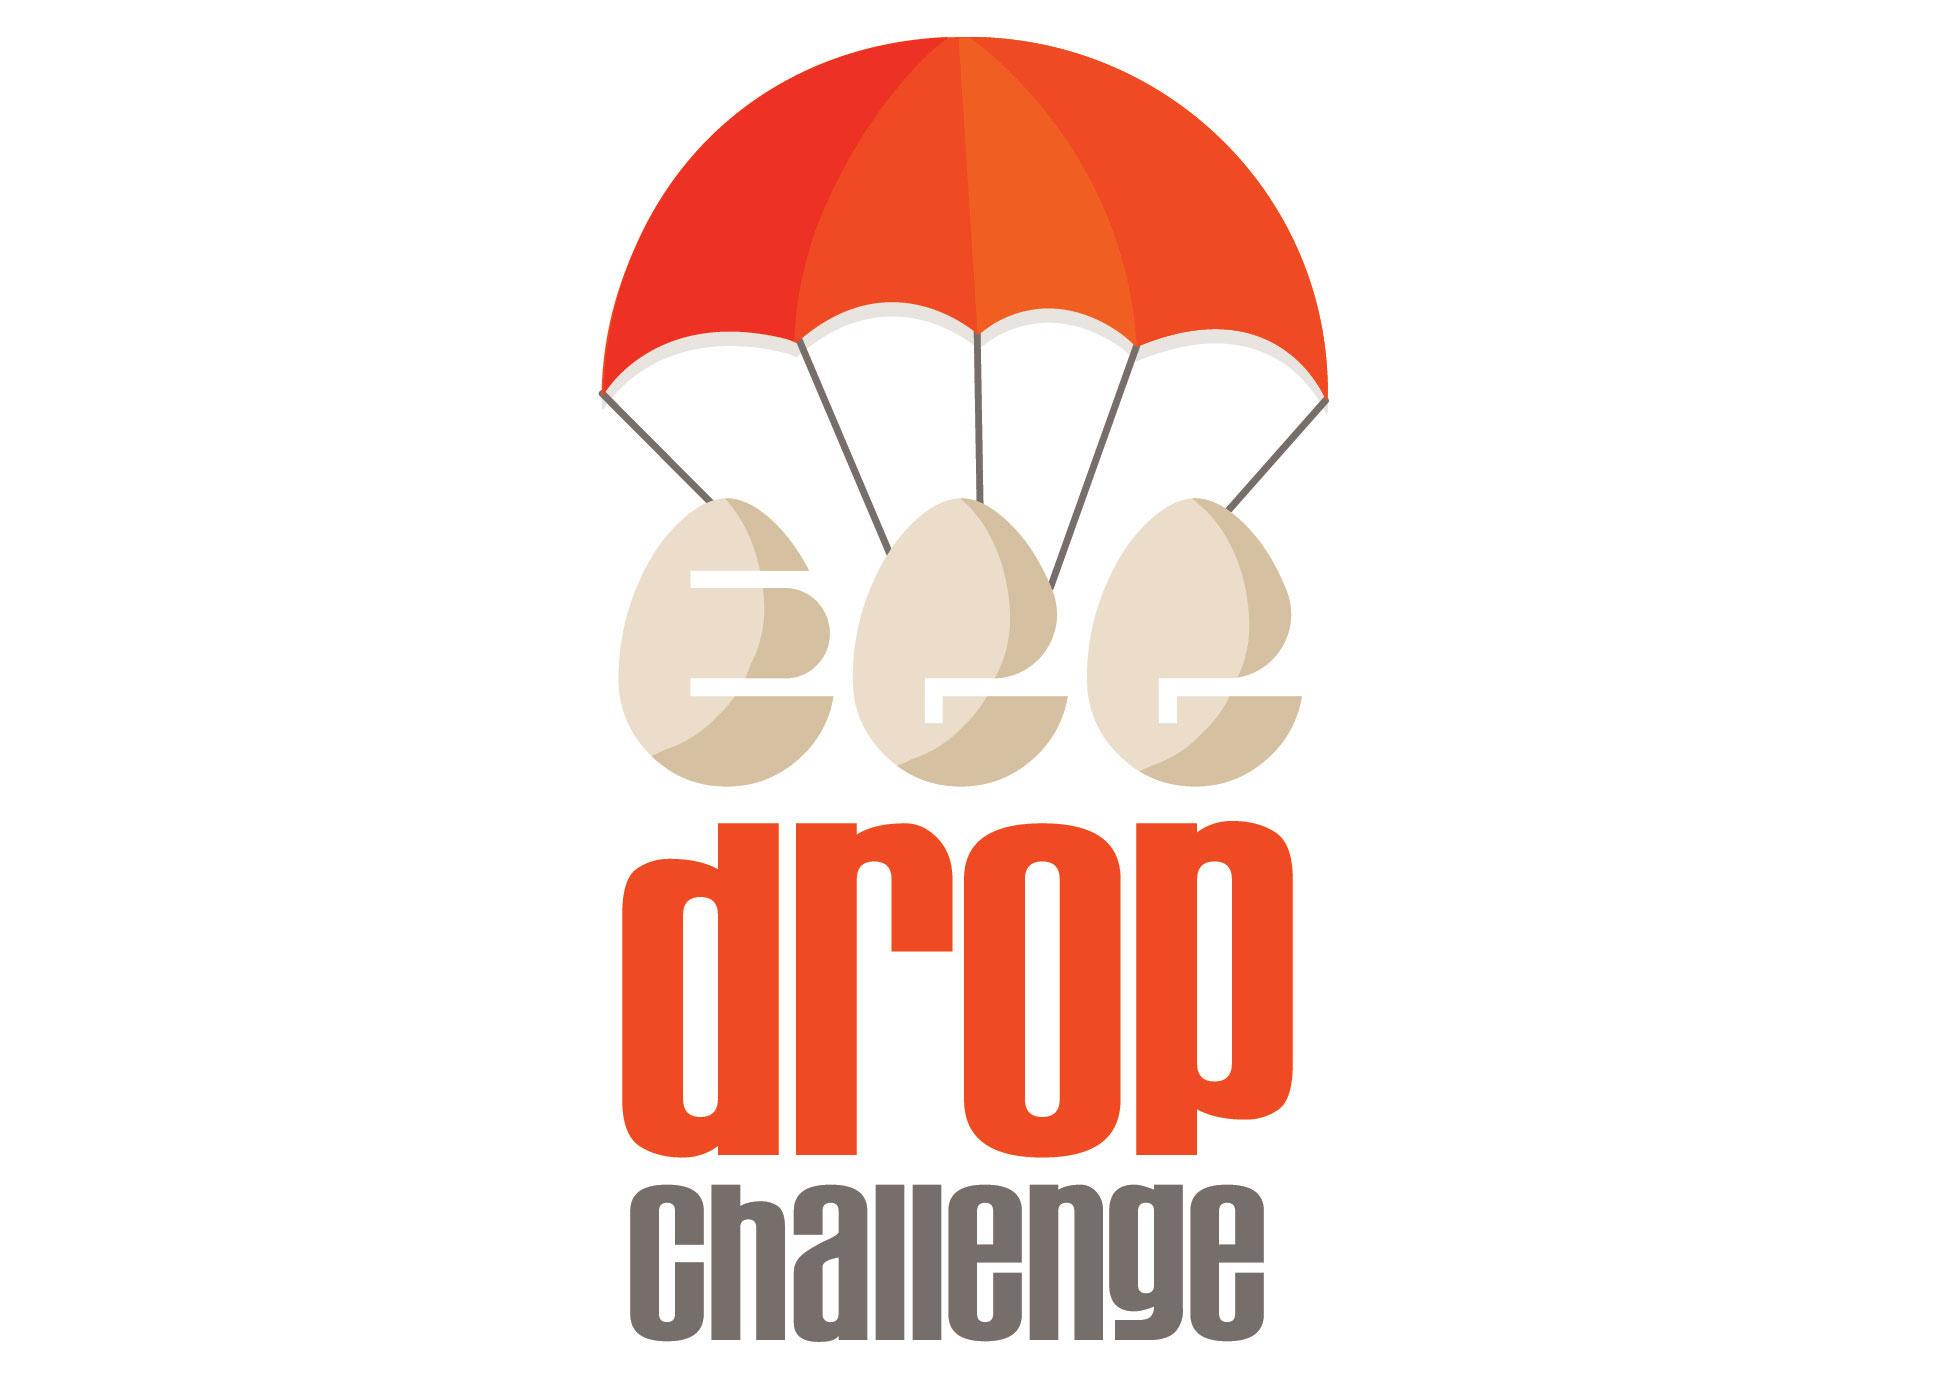 Best Egg Drop Contest Design